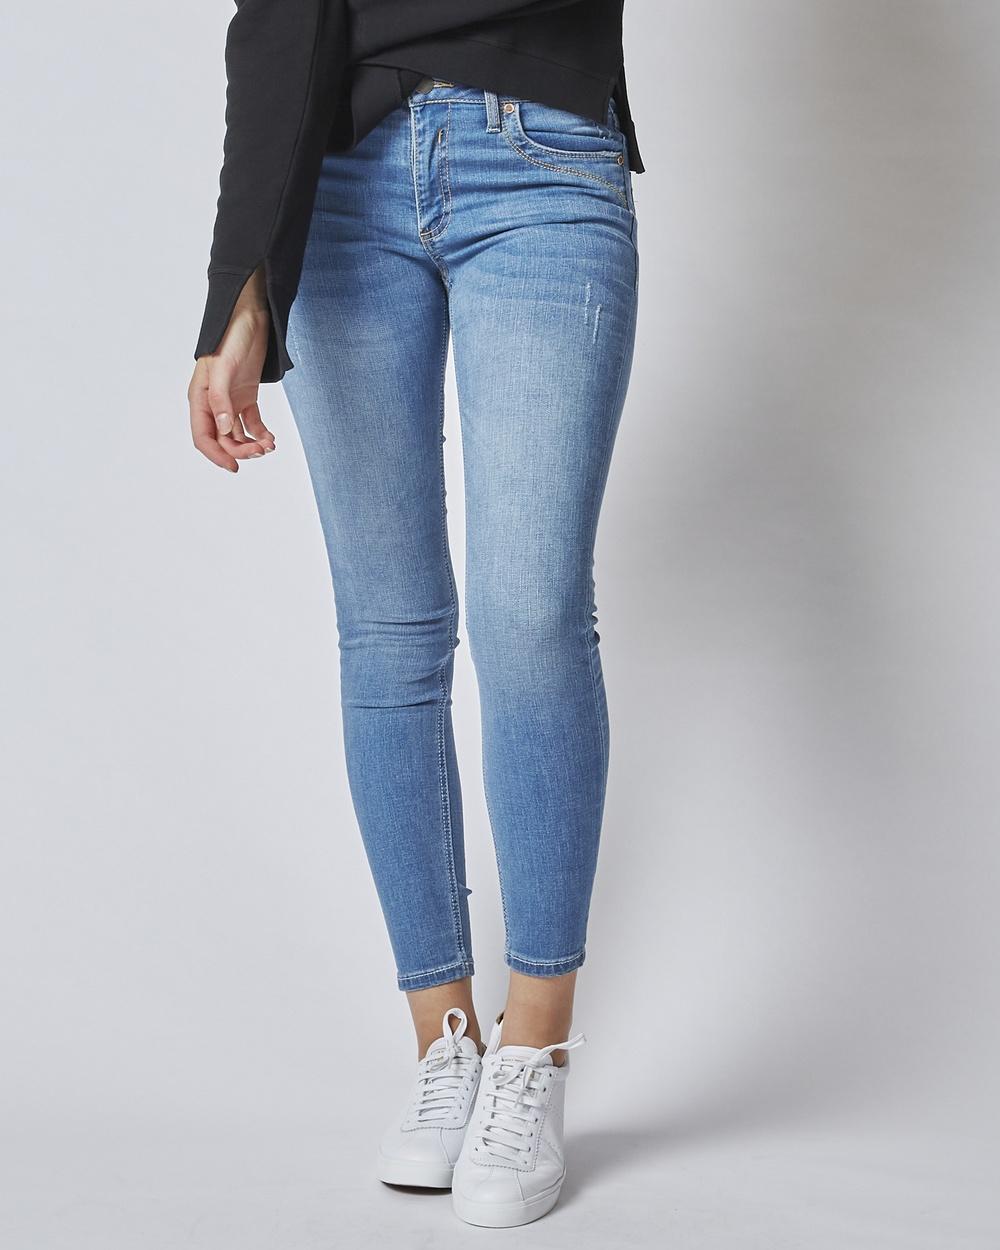 DRICOPER DENIM Lauren Jeans Lighties Australia